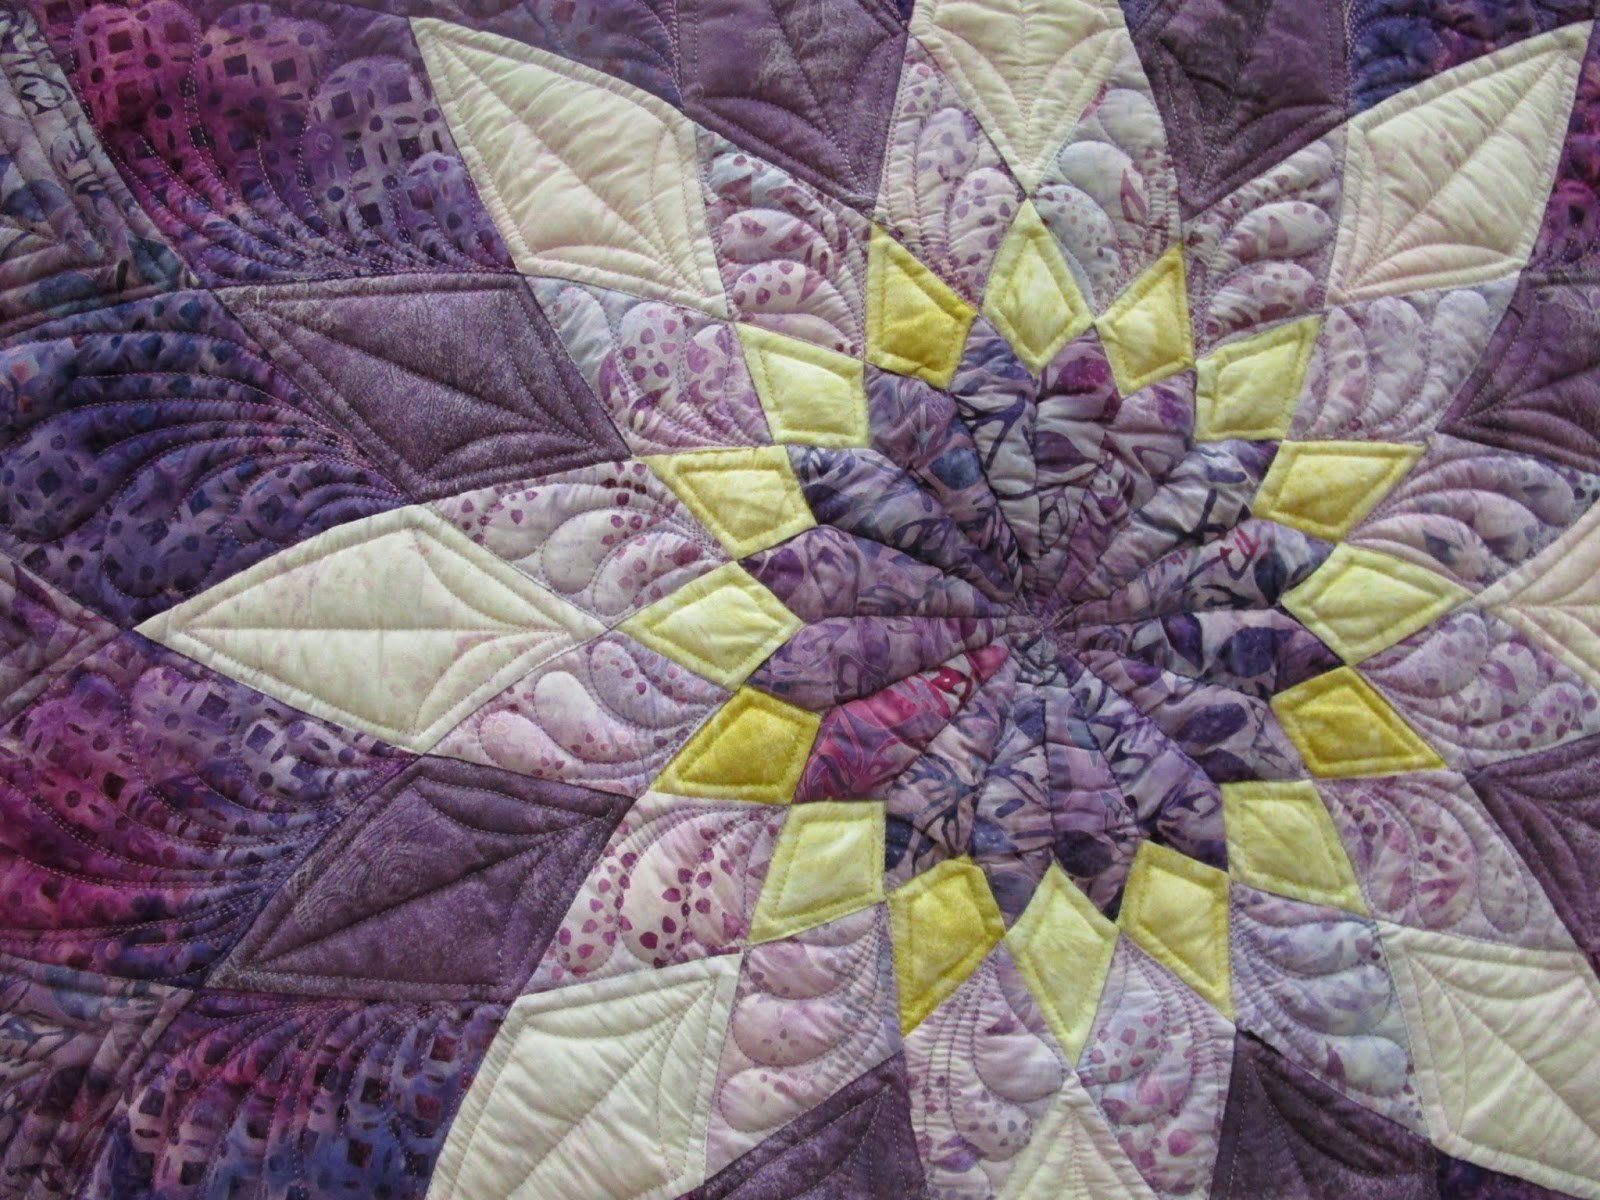 Threadmongers: Sunbonnet Sue Quilt Club 30th Annual Quilt Show ... : sunbonnet sue quilt club sequim - Adamdwight.com